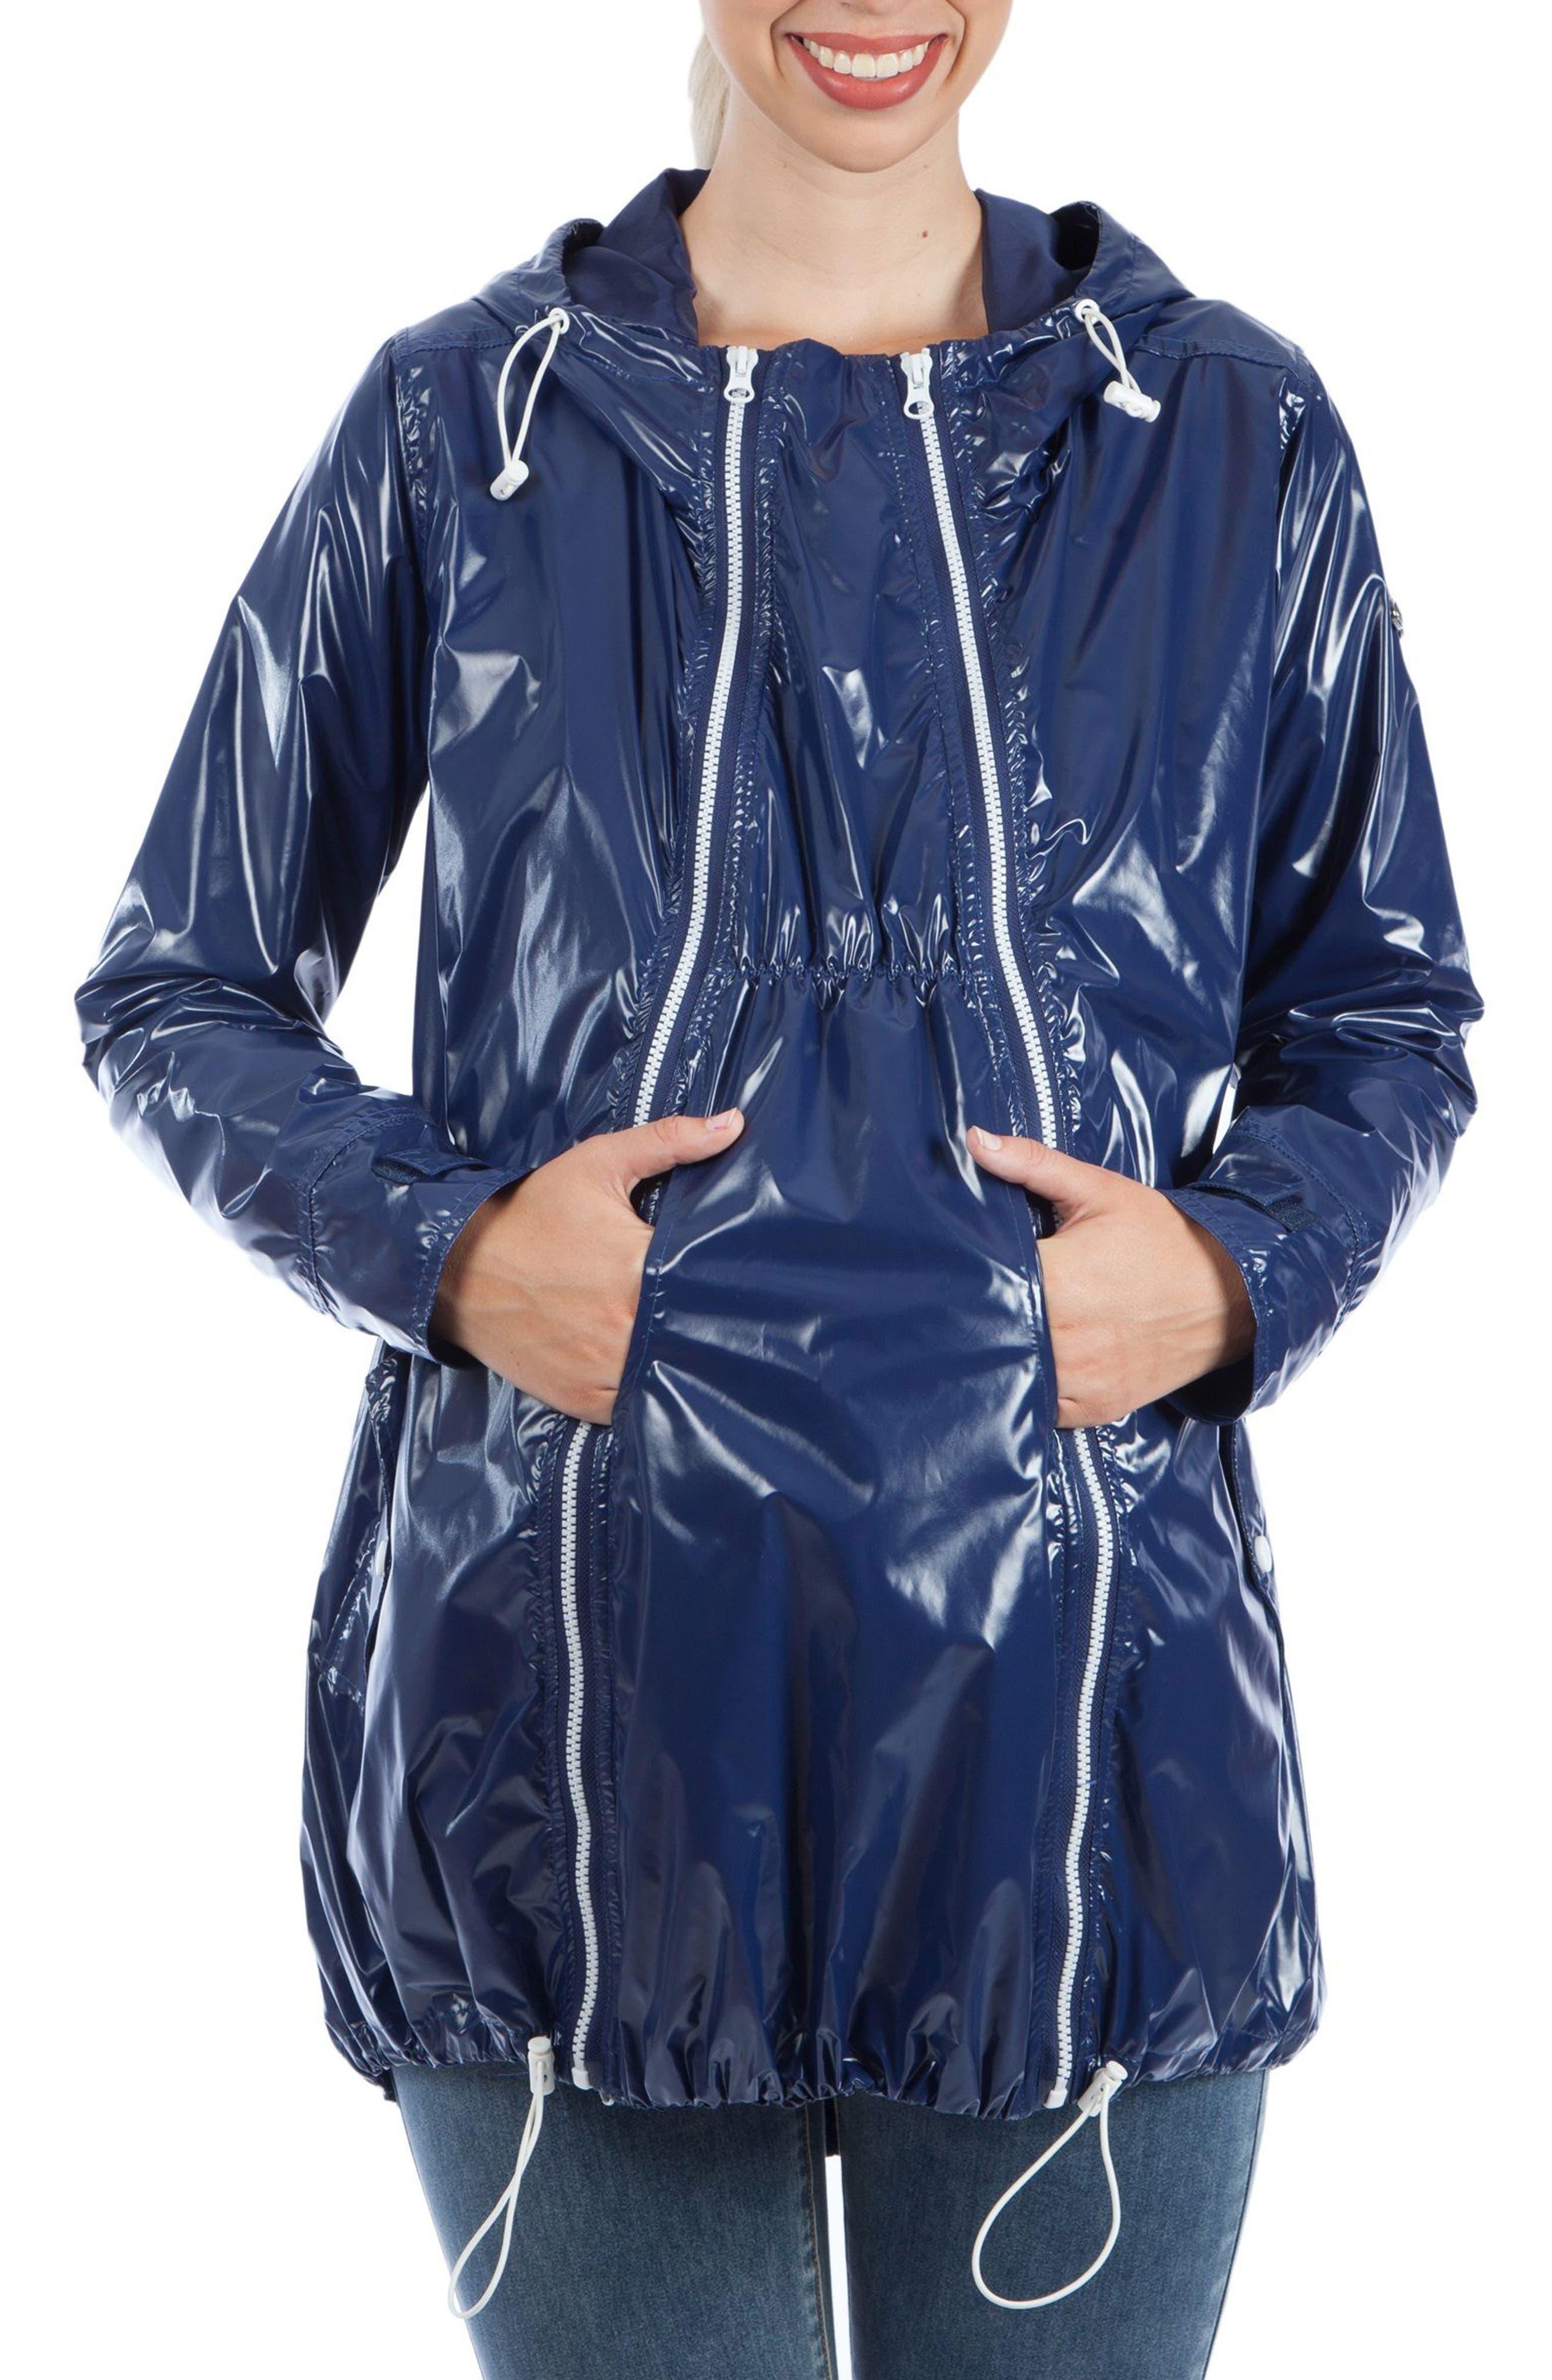 Waterproof Convertible 3-in-1 Maternity Raincoat,                             Alternate thumbnail 5, color,                             BRIGHT NAVY